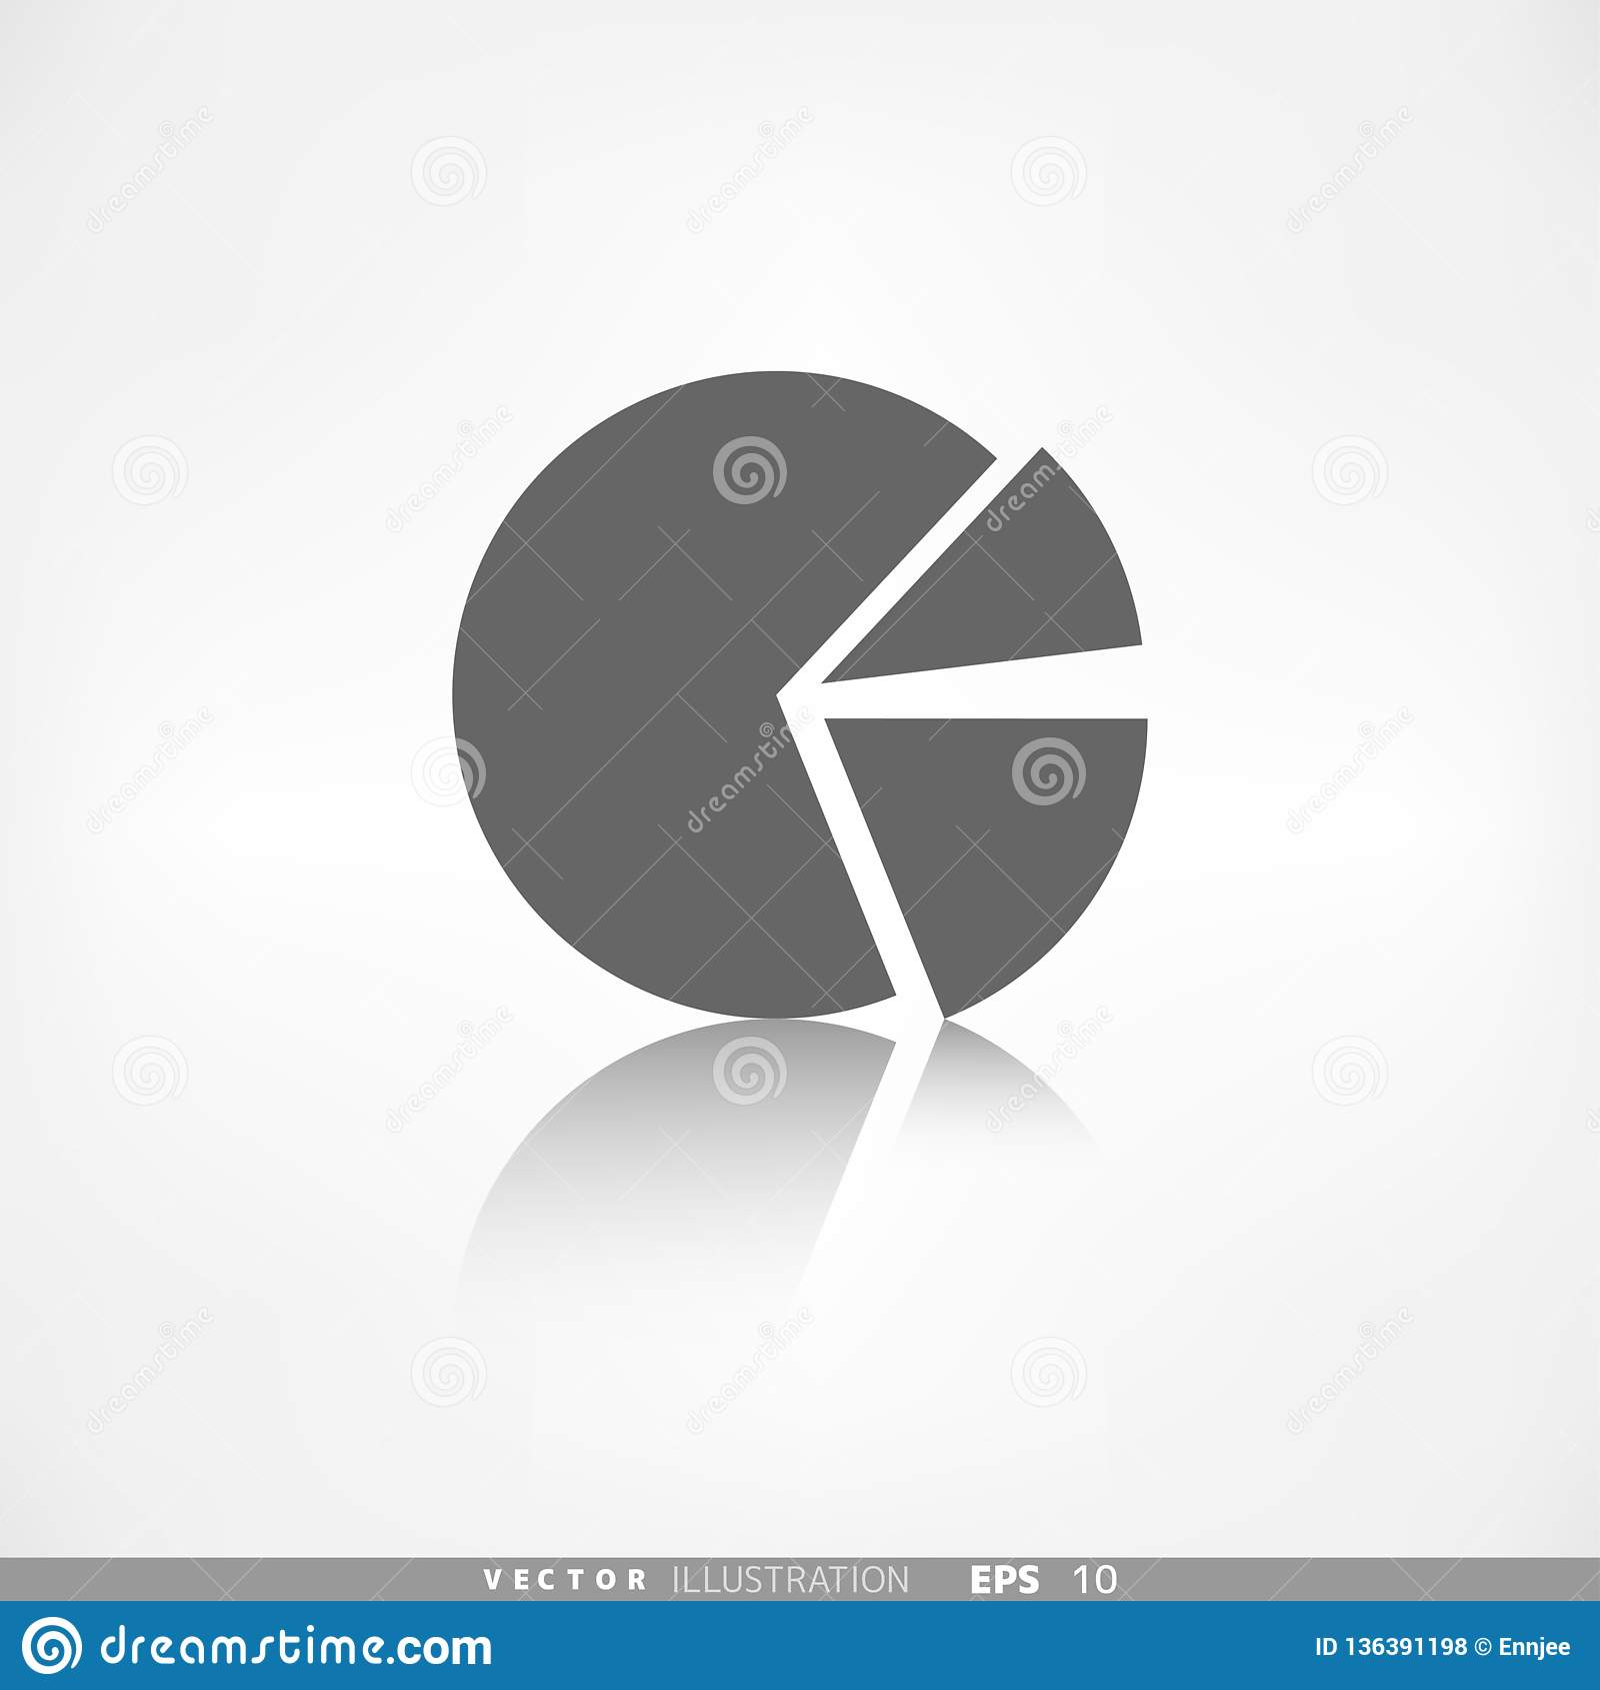 Circular Diagram Web Icon Vector Illustration  Stock Vector